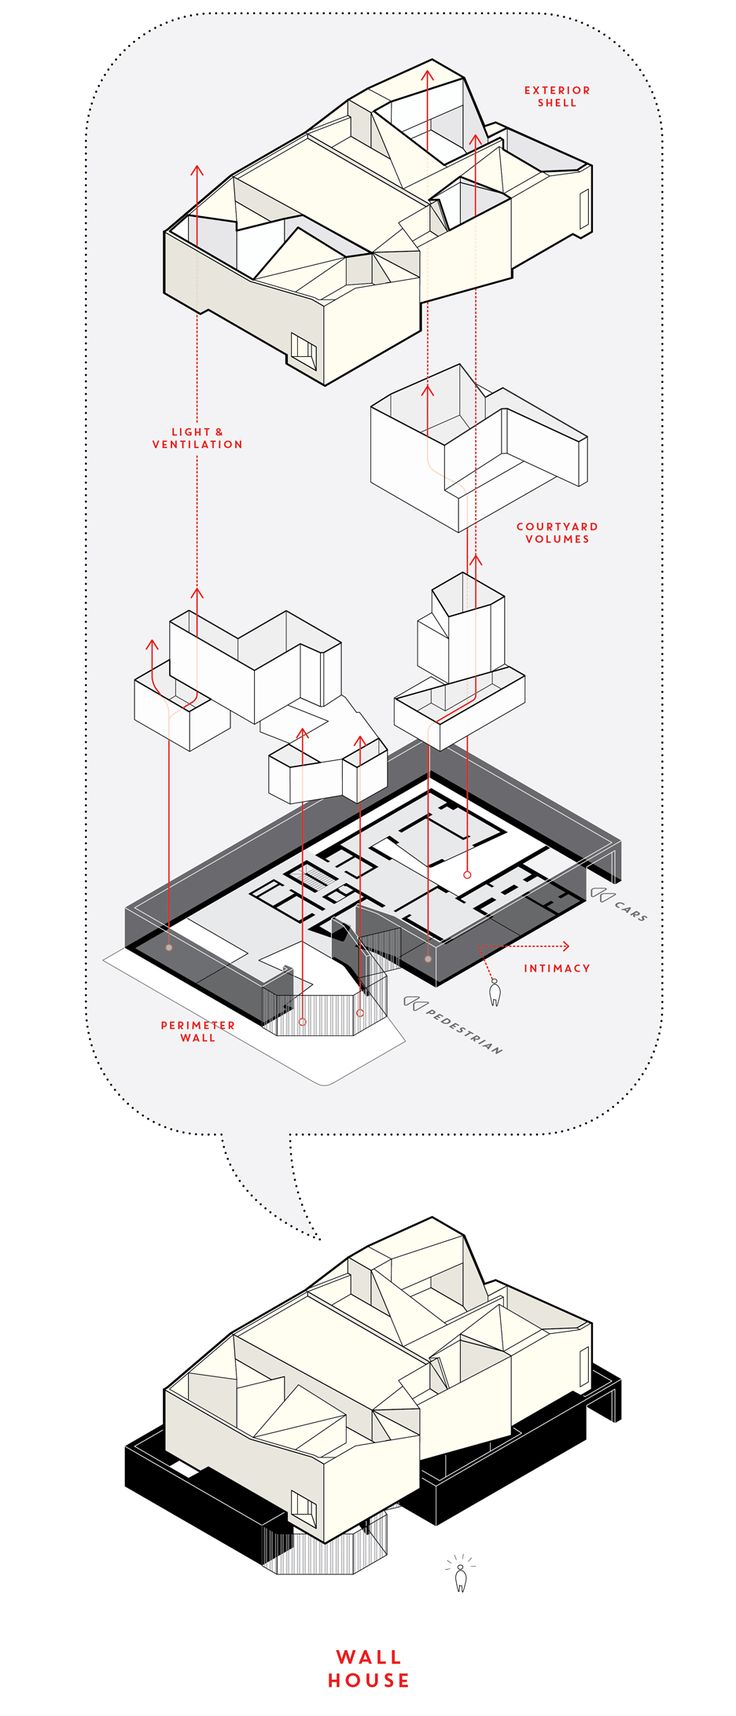 wall-house-agi-architects_dezeen_01